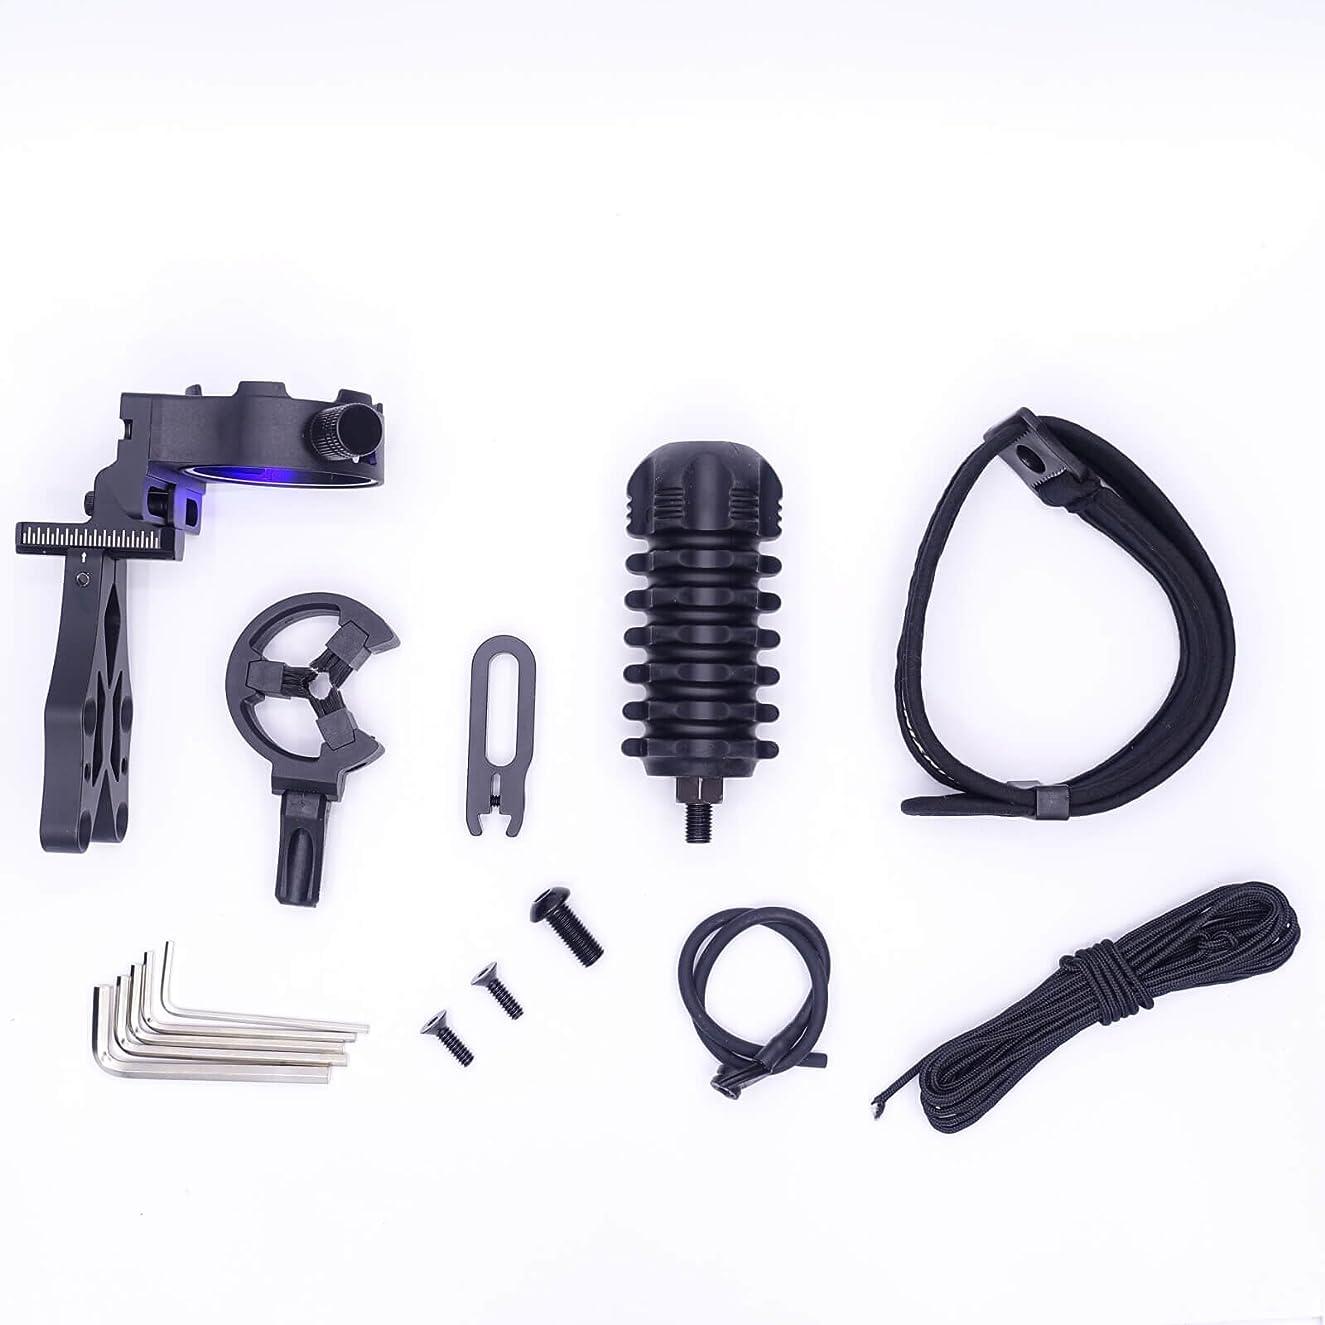 Mandarin Duck Compound Bow Upgrade Combo Kit Black Sight Arrow Rest Stabilizer Slight